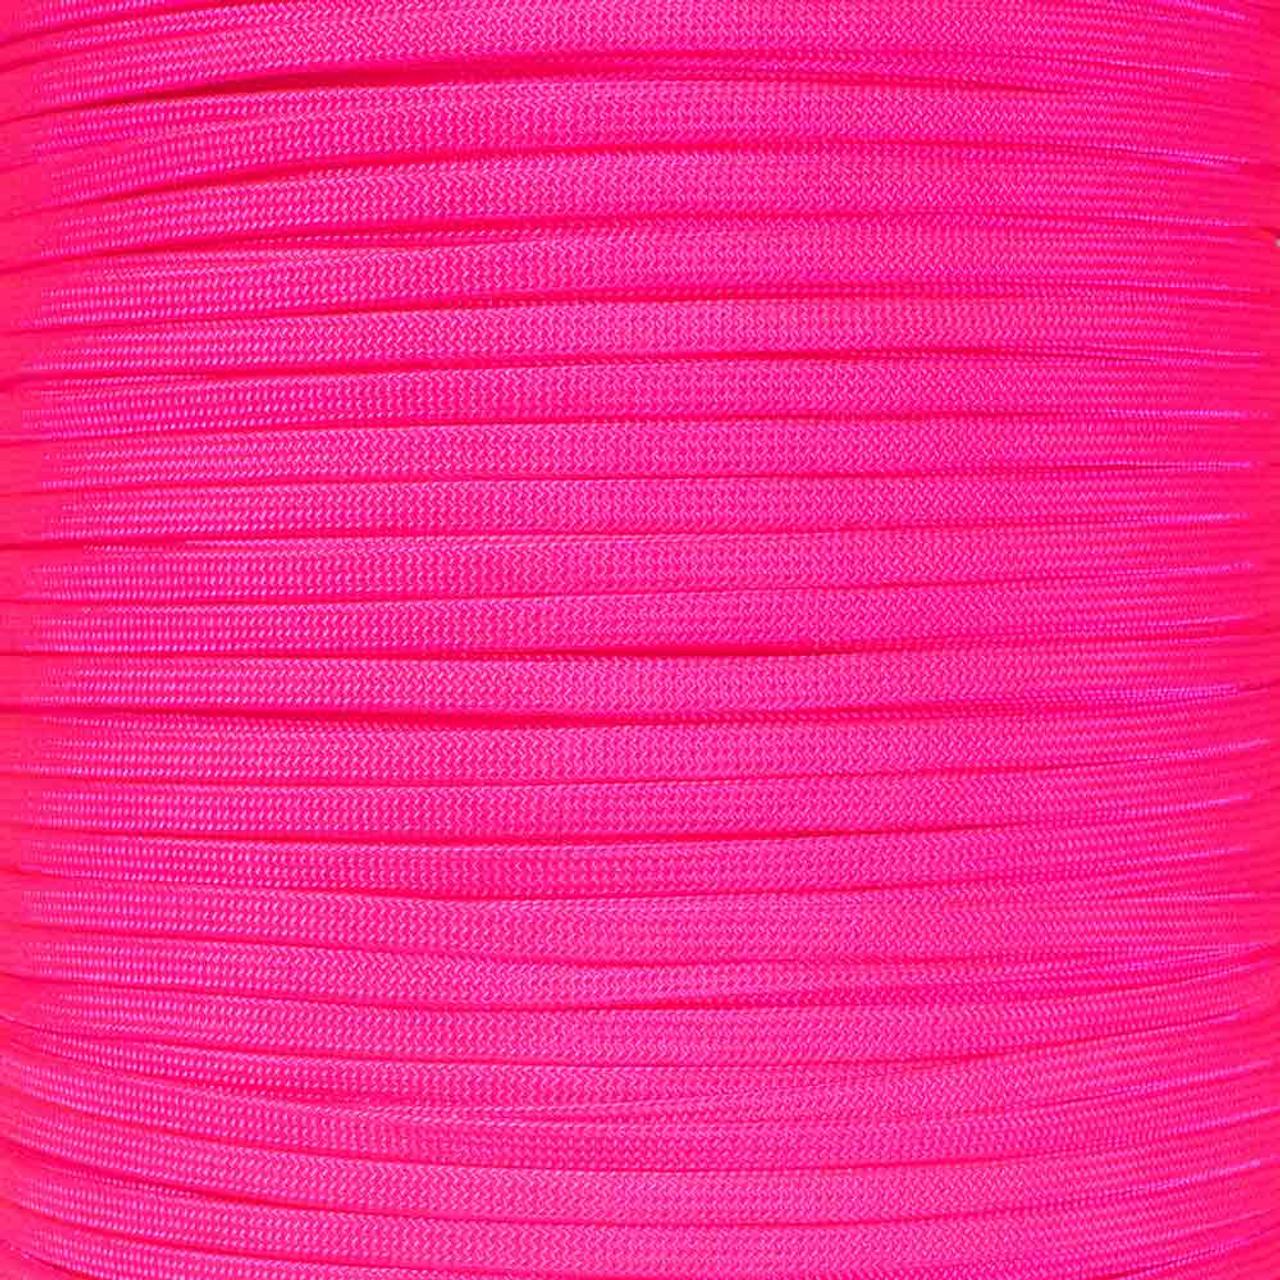 Pet Apparel West Coast Paracord Coreless 650 Nylon Cord Home D/écor Craft Projects Neon Yellow, 50 Feet